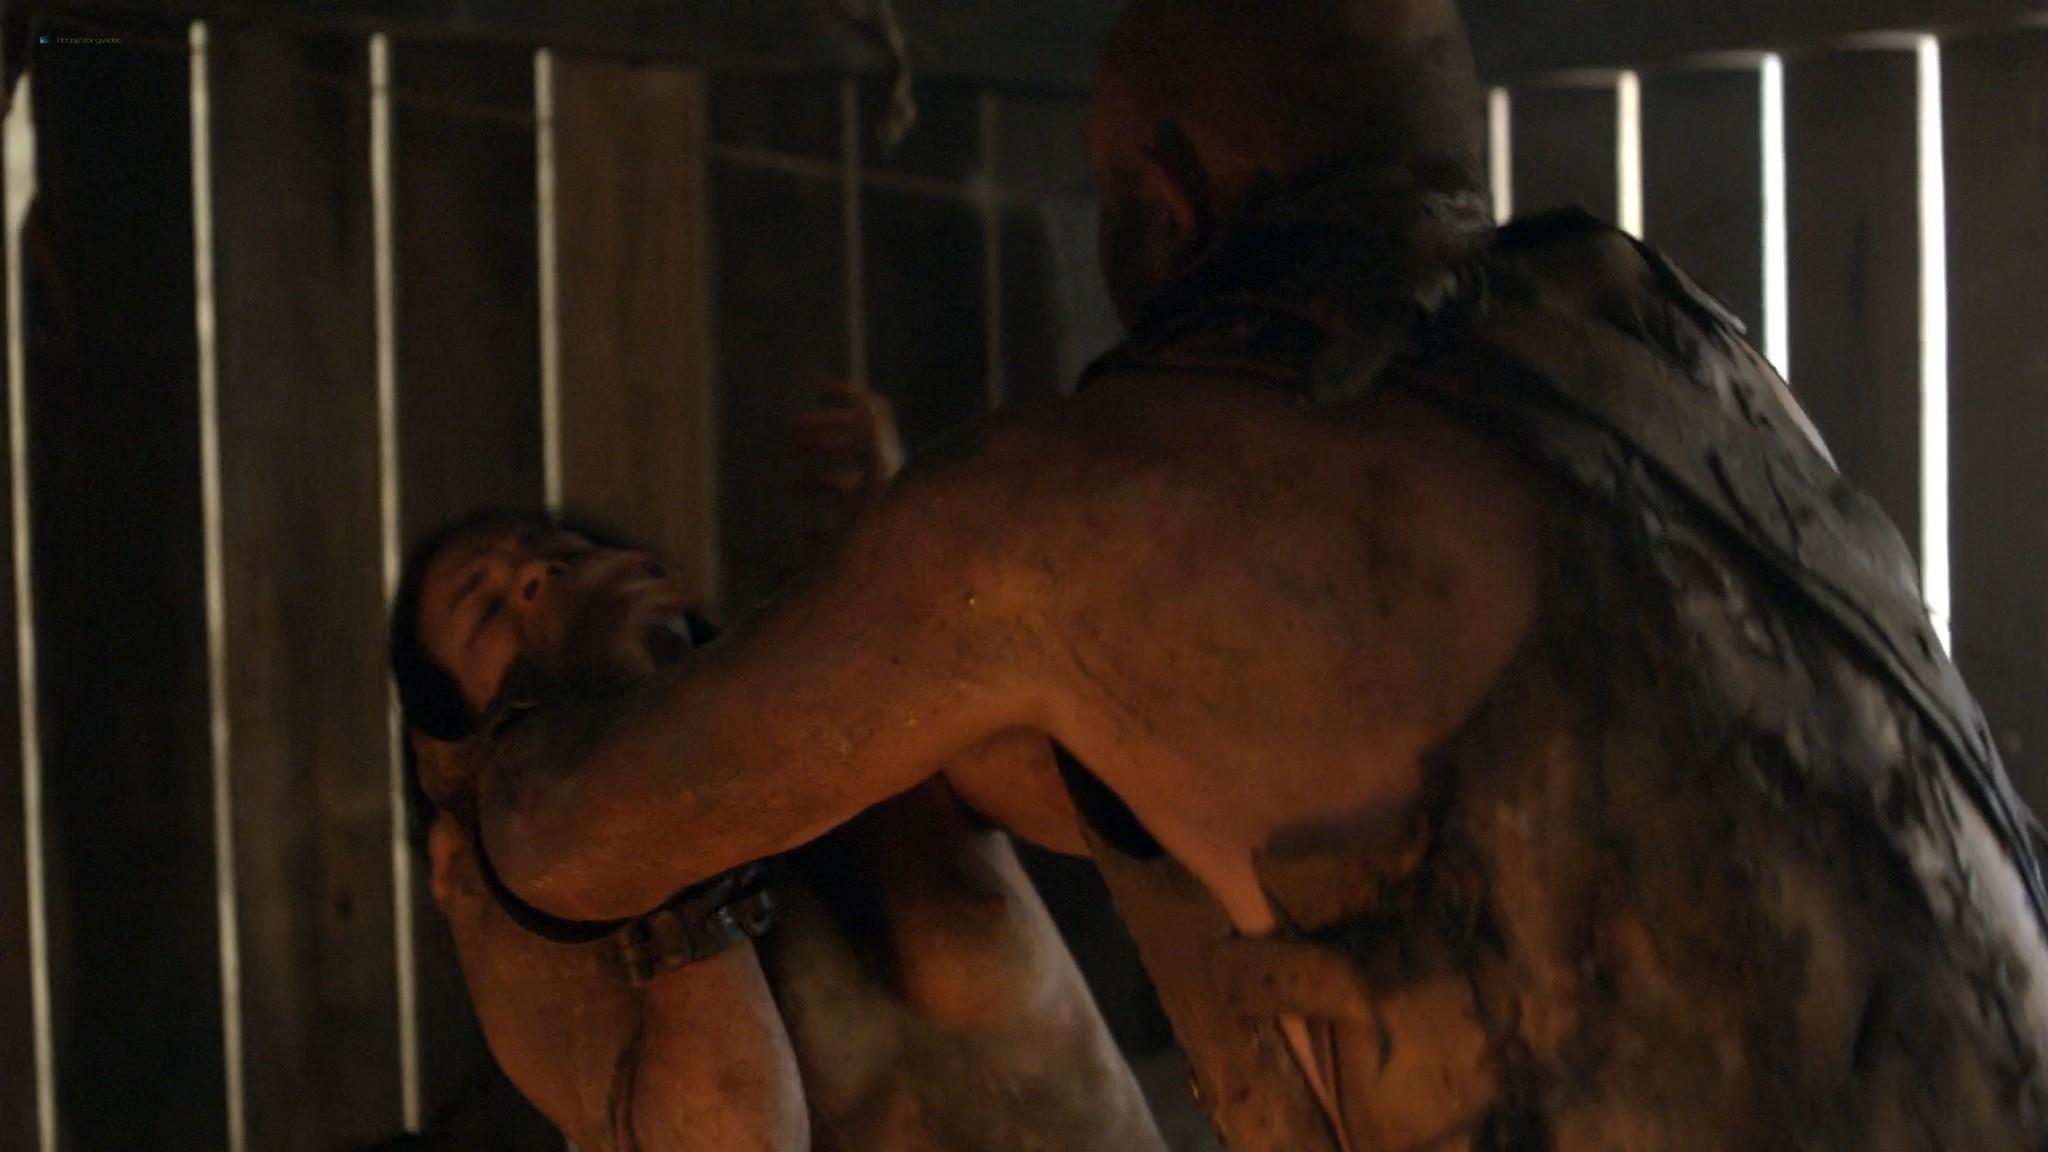 Viva Bianca nude topless Katrina Law, Bonnie Sveen, etc -Spartacus - Vengeance (2012) e3 1080p (3)